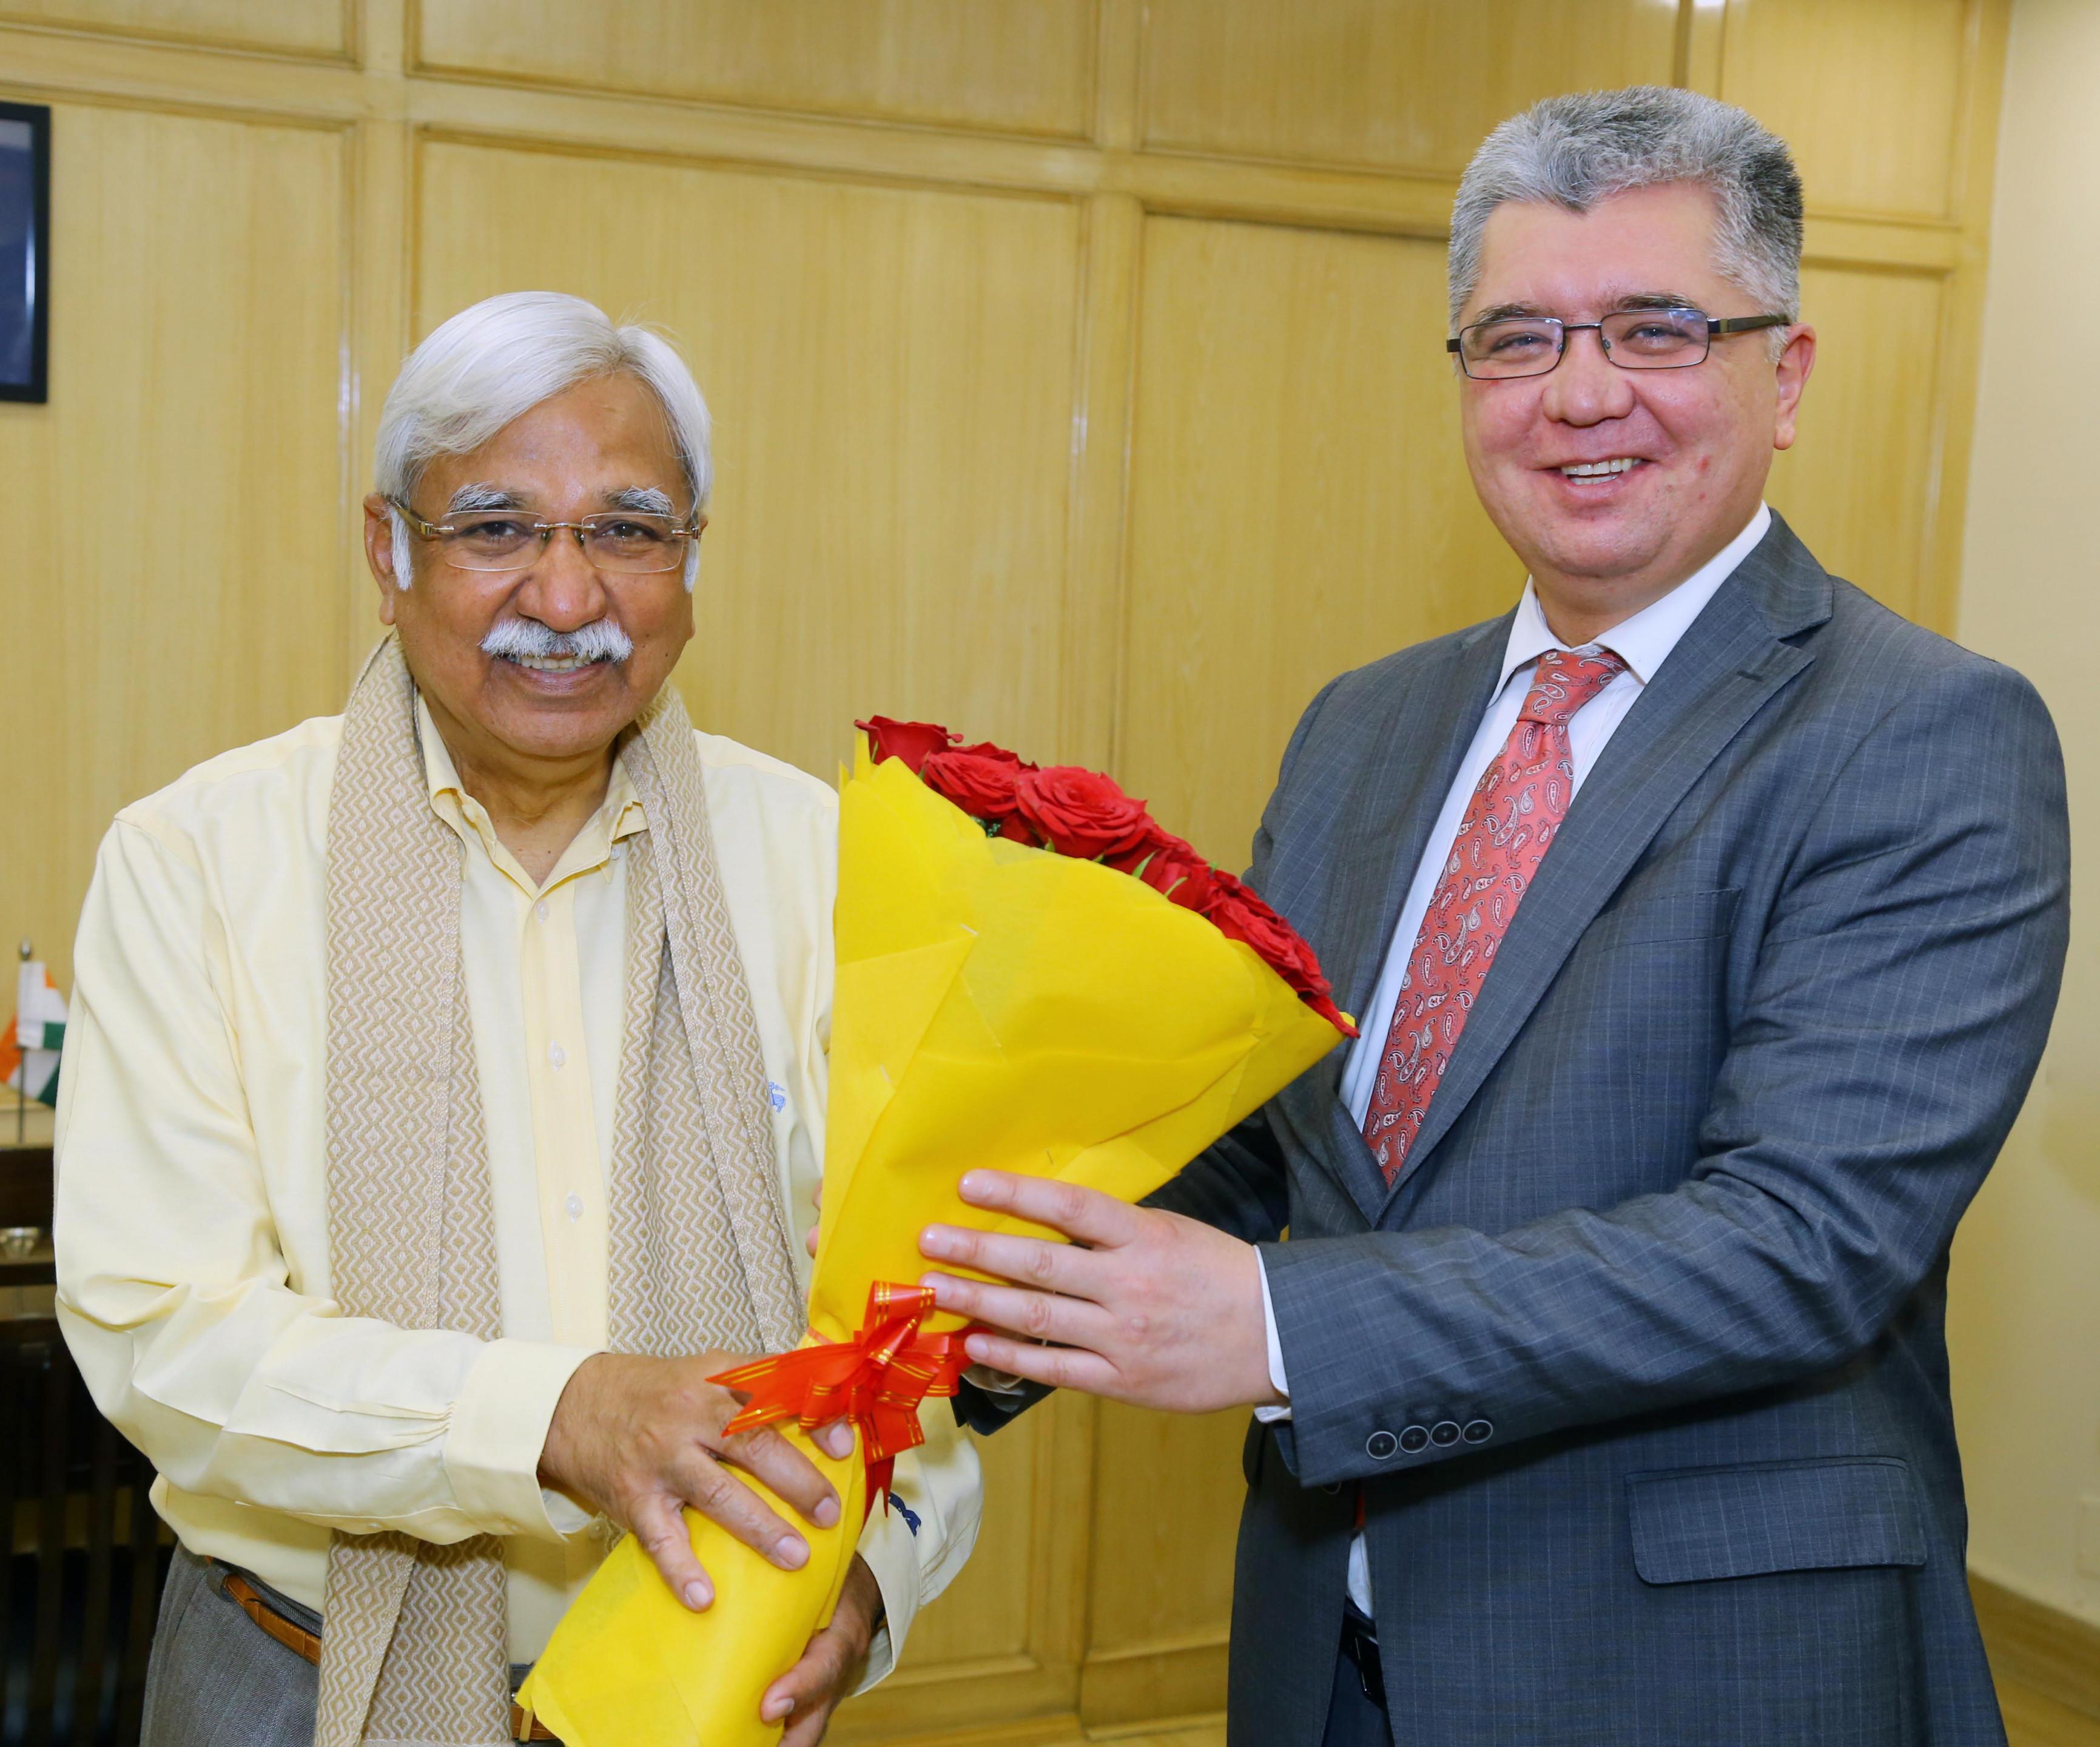 Mr. Dilshod Akhatov, Ambassador of the Republic of Uzbekistan to India met Mr. Sunil Arora Chief Election Commissioner of India on 8th February, 2021 in Nirvachan Sadan, New Delhi